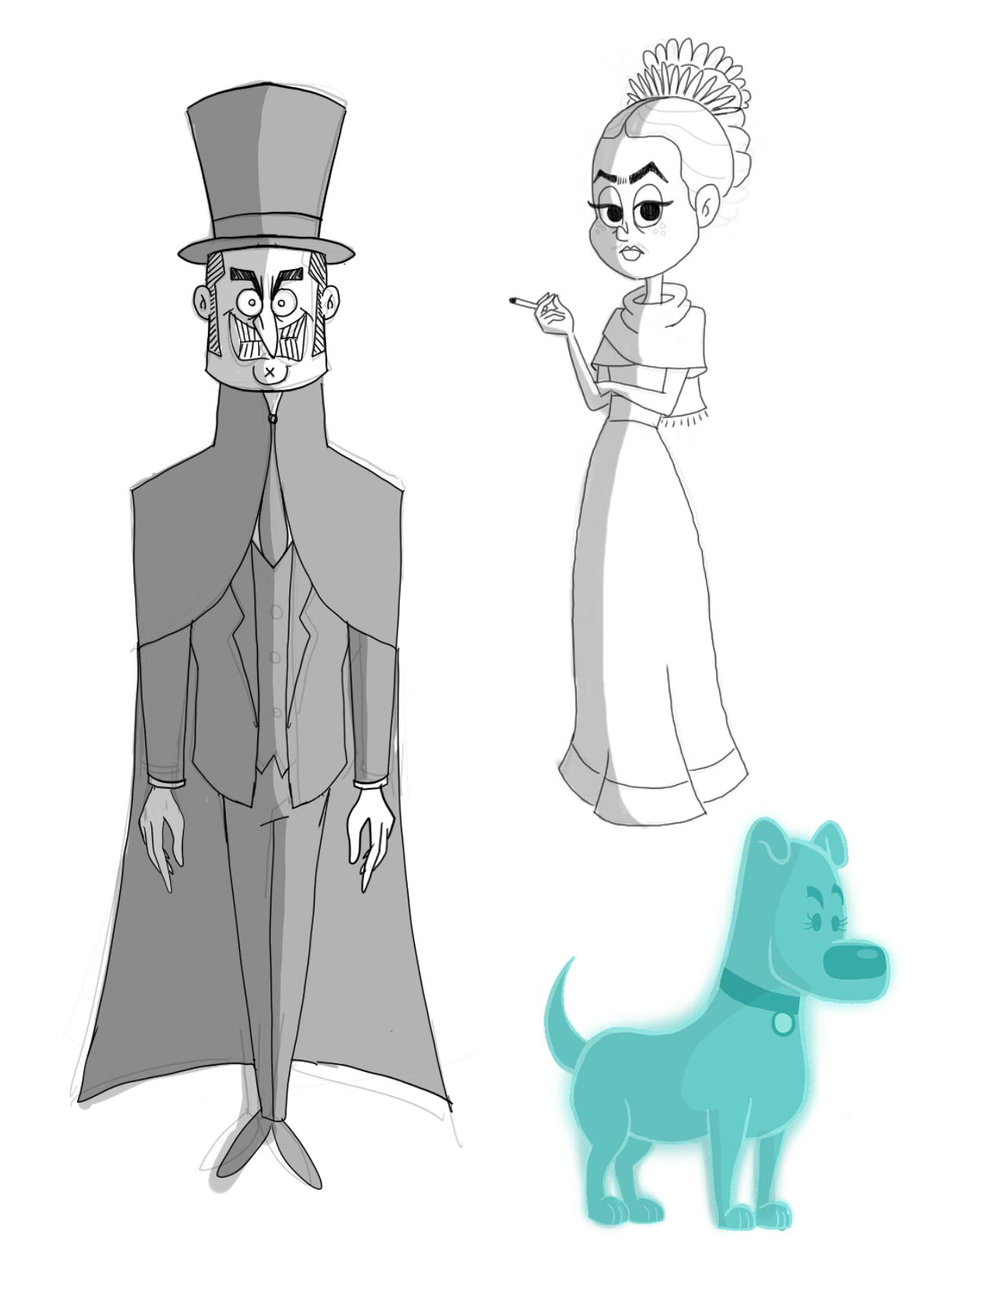 random sketches 191.jpg